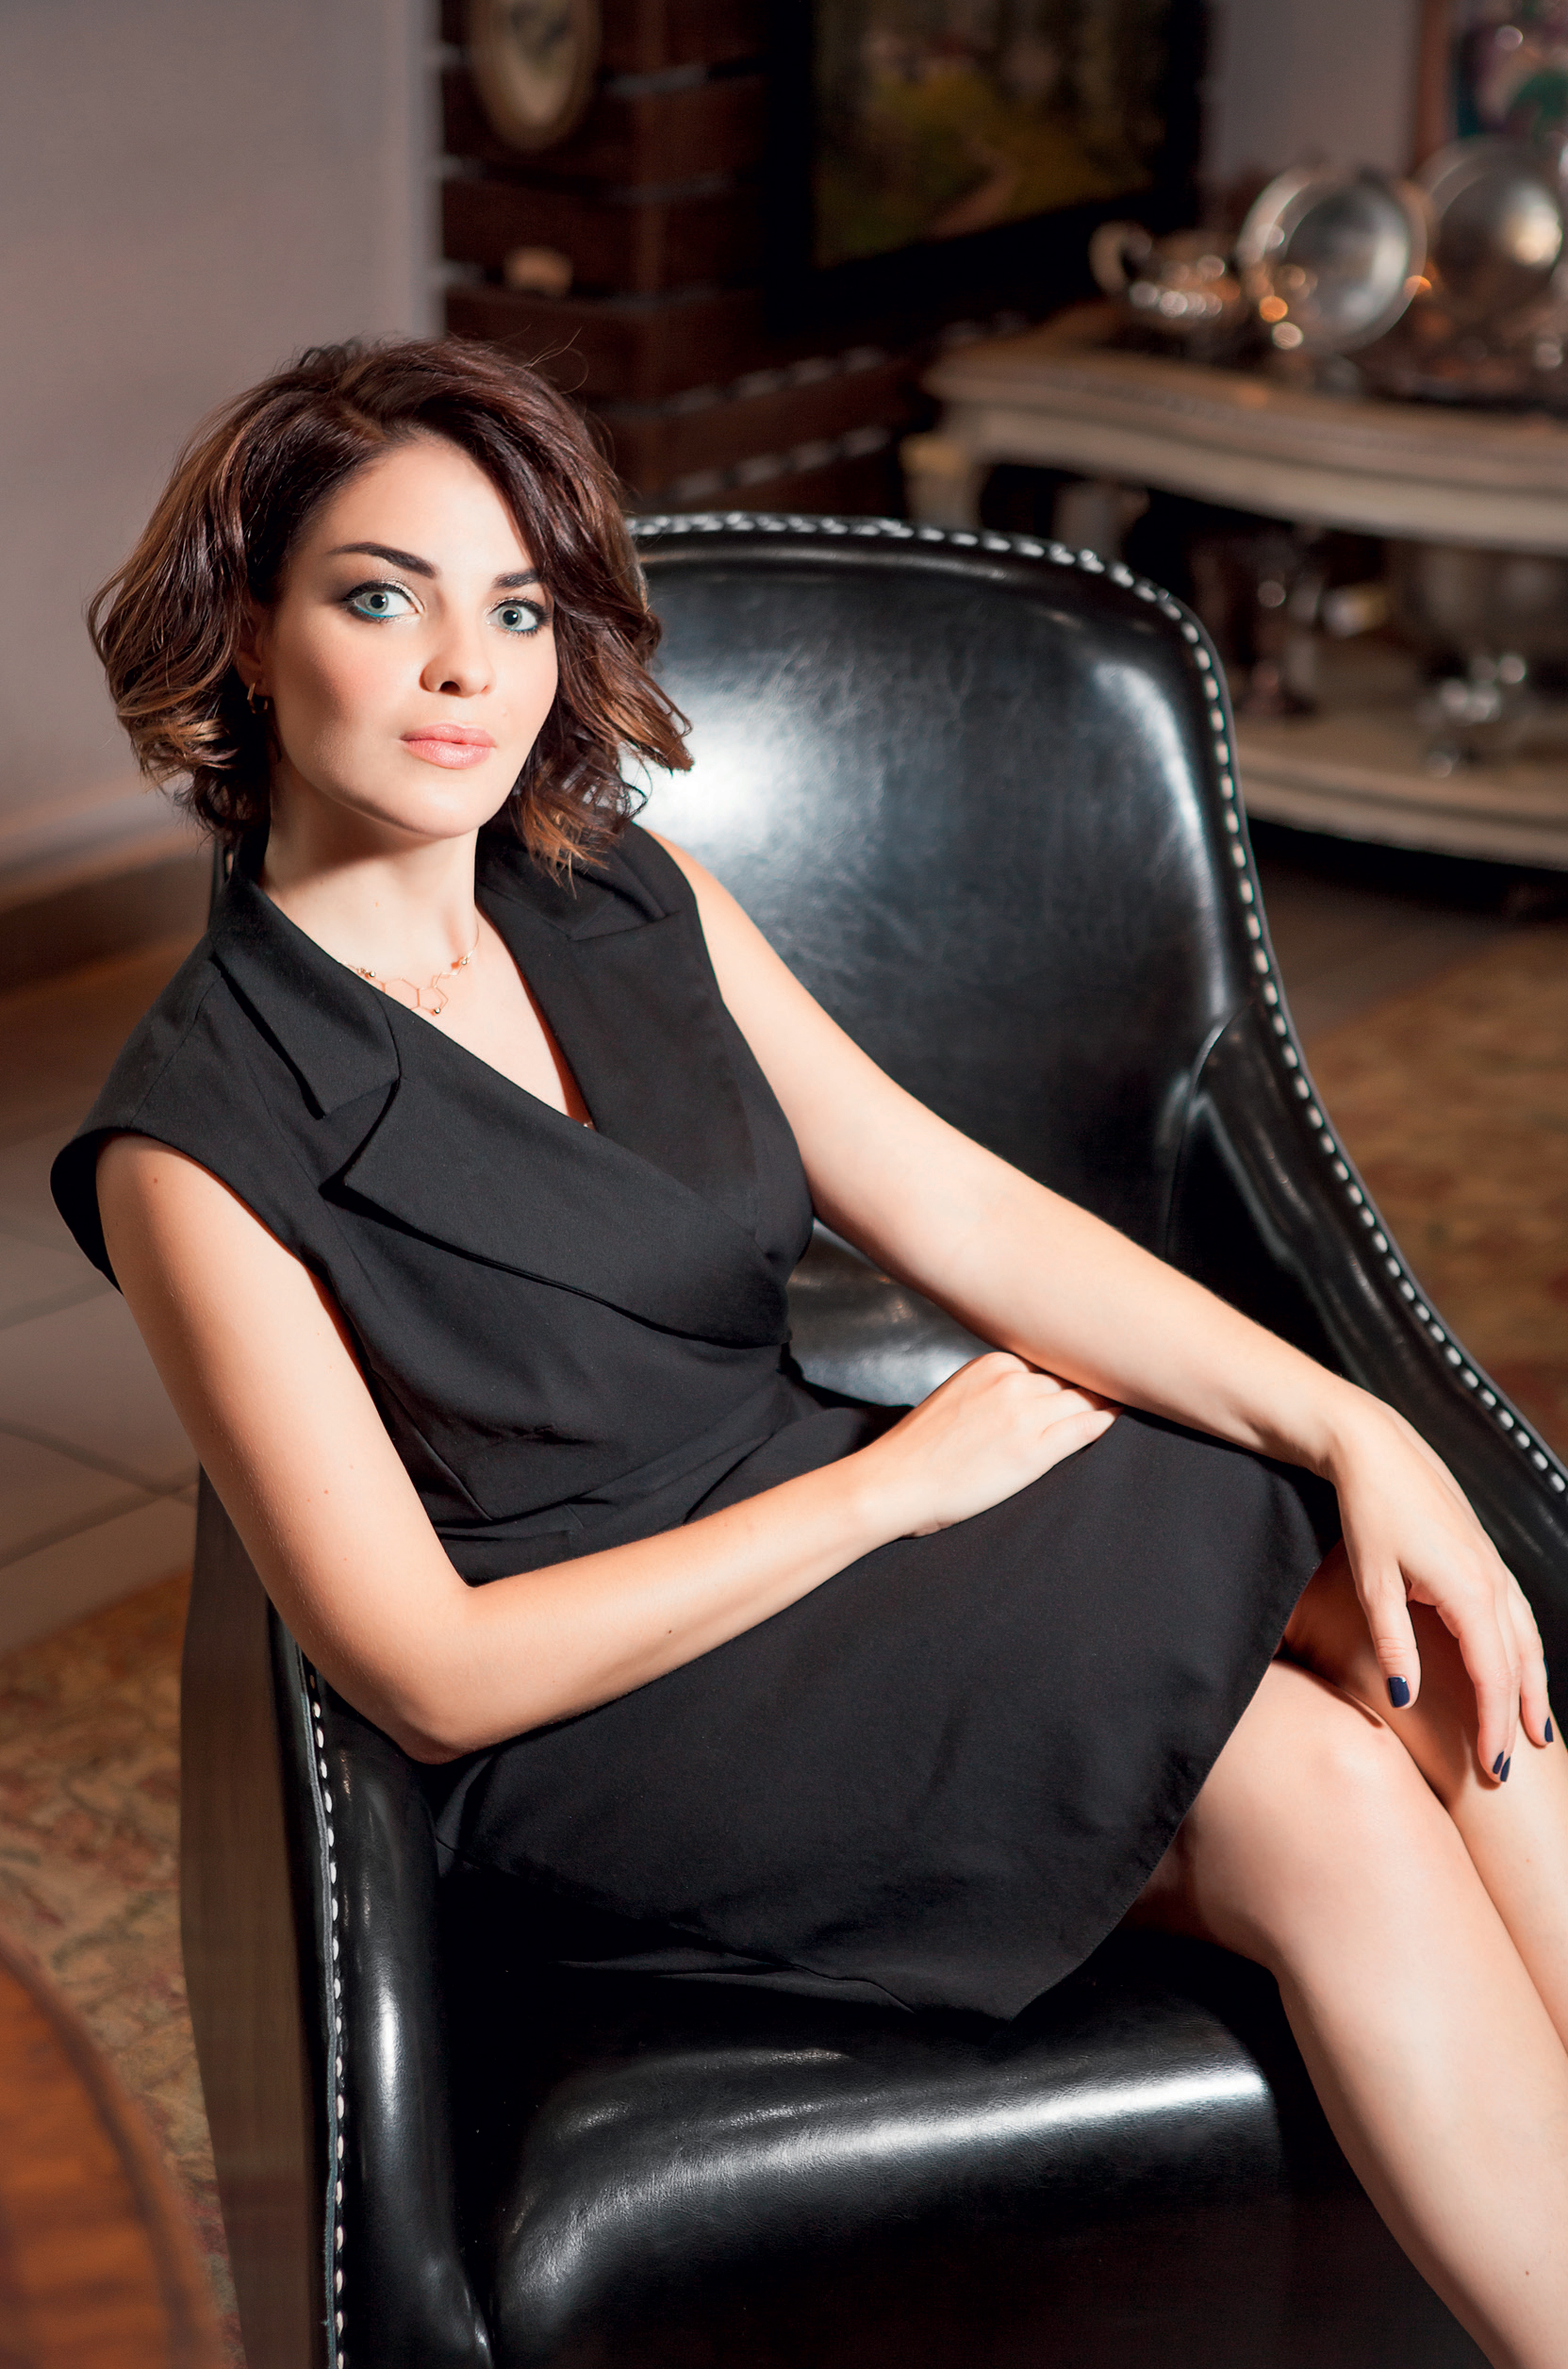 Валерия юдина веб модели jasmine